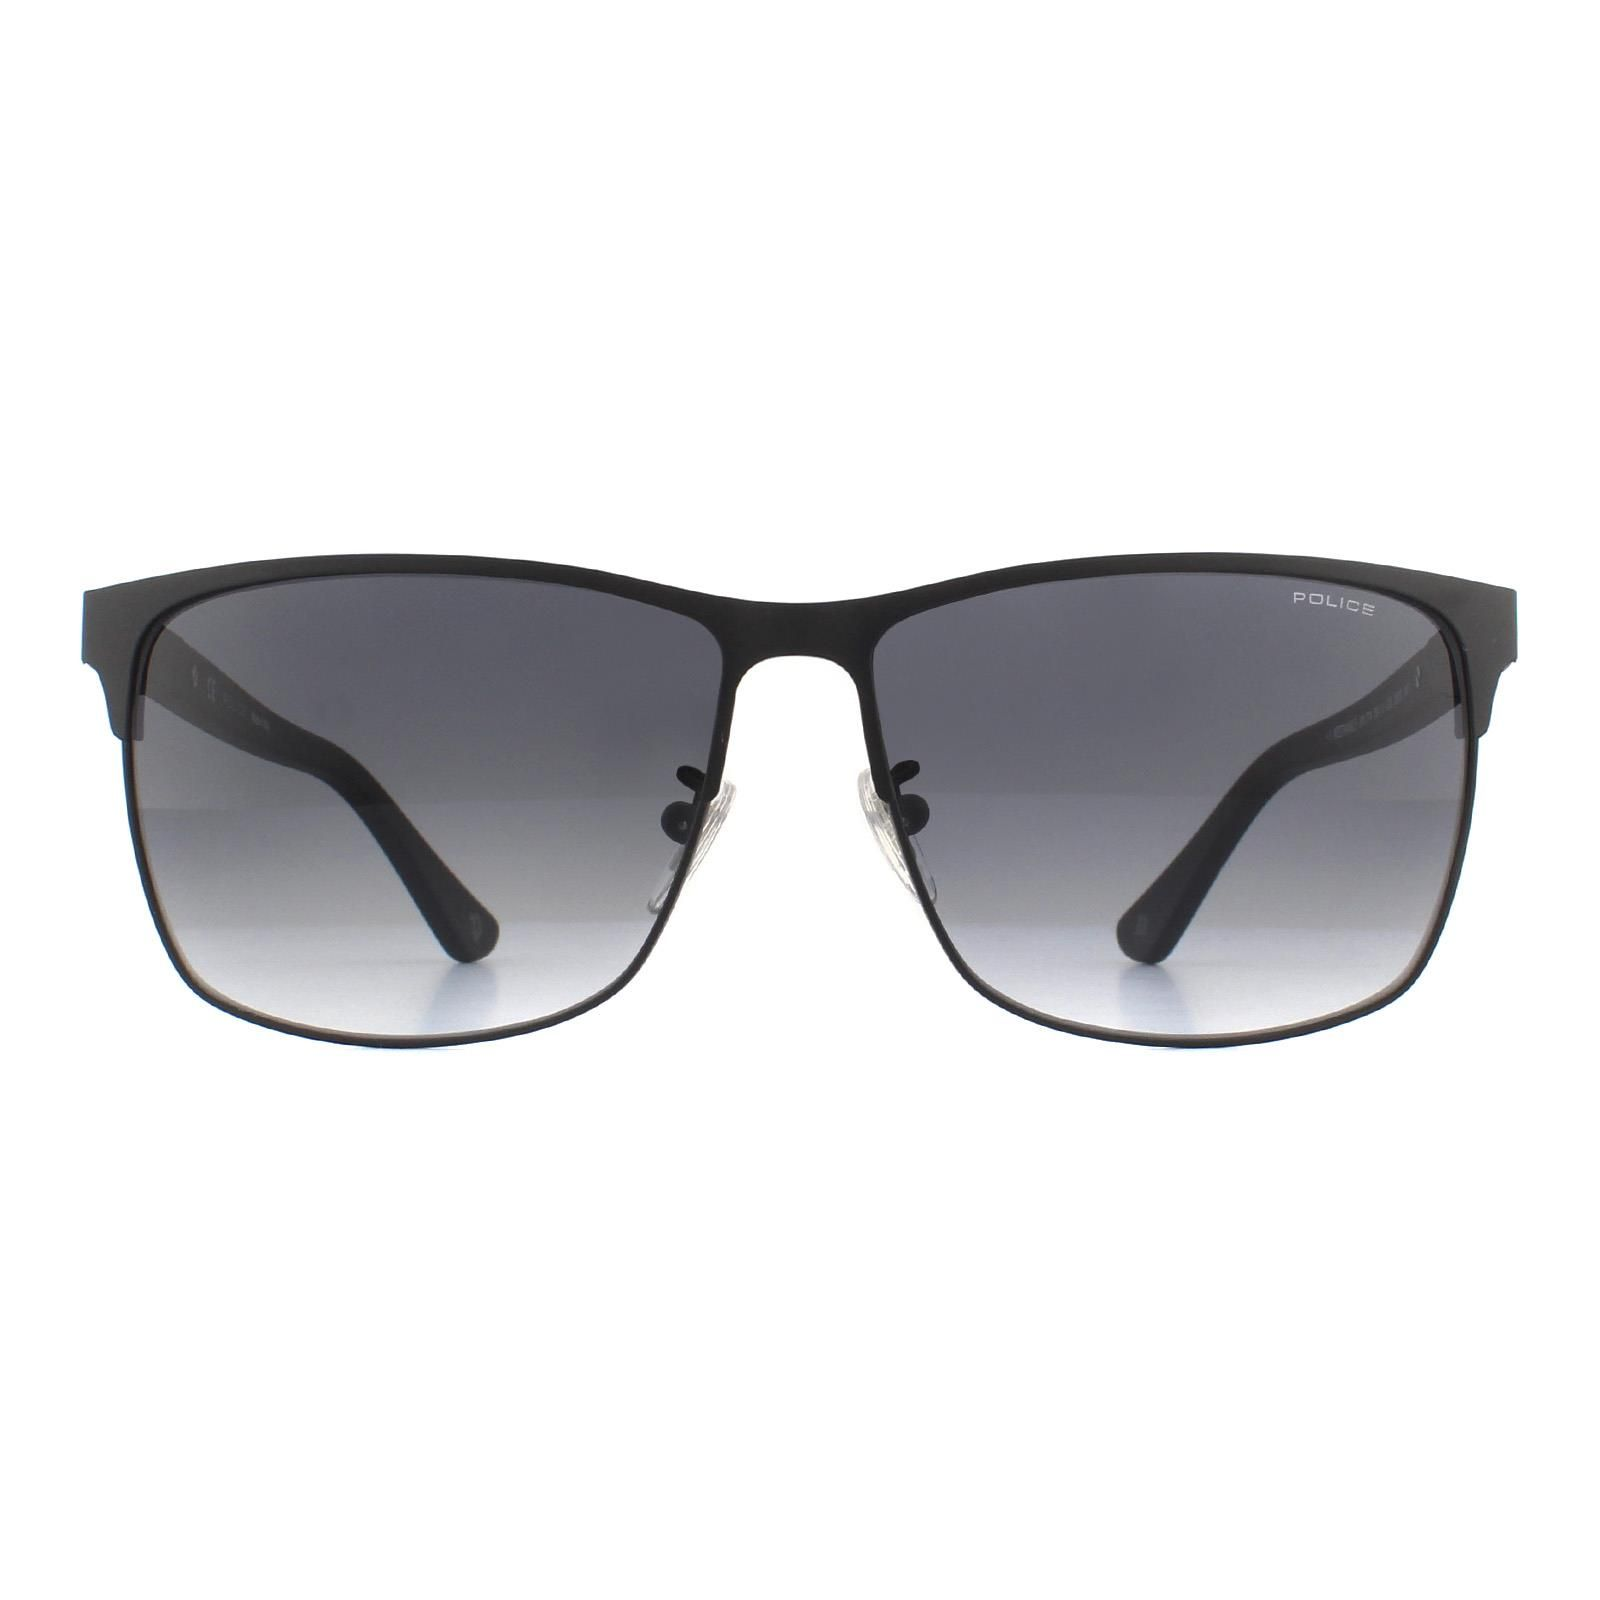 Police Sunglasses SPL774 Westwing 5 0SCQ Semi Matte Black Grey Gradient